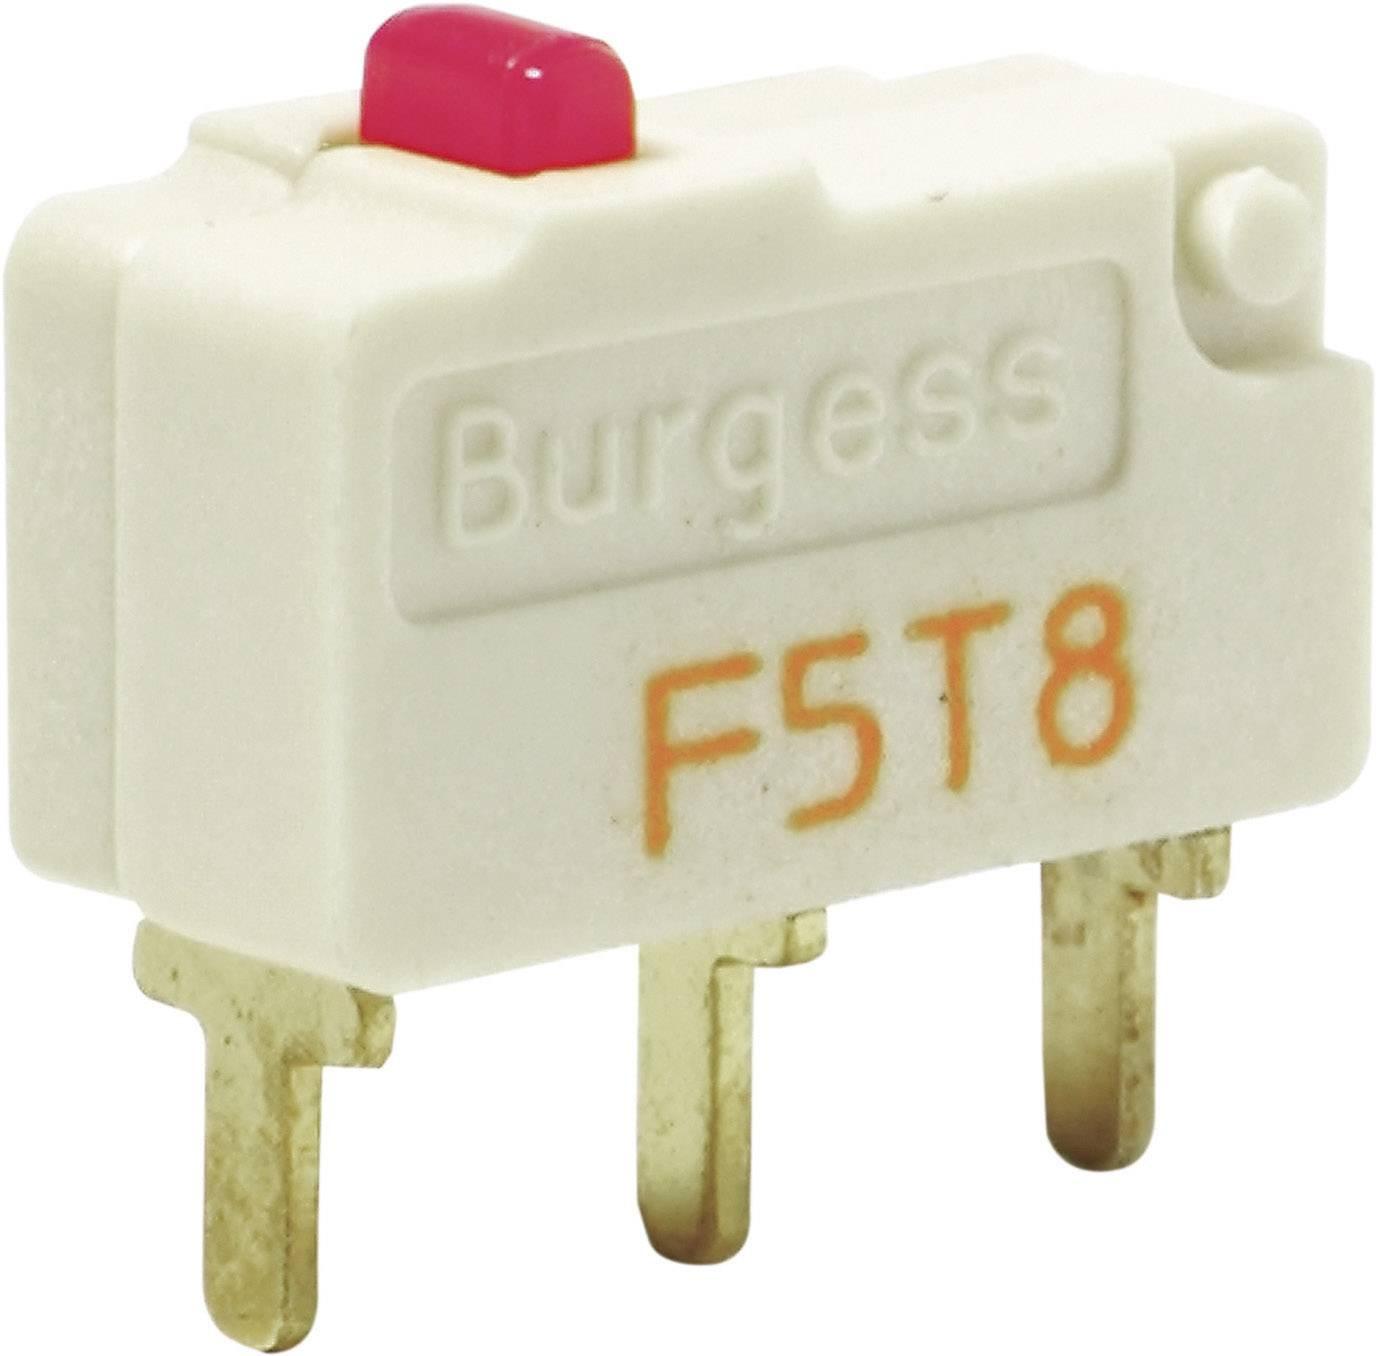 Mikrospínač - tŕň Burgess F5T8UL, 250 V/AC, 5 A, IP40